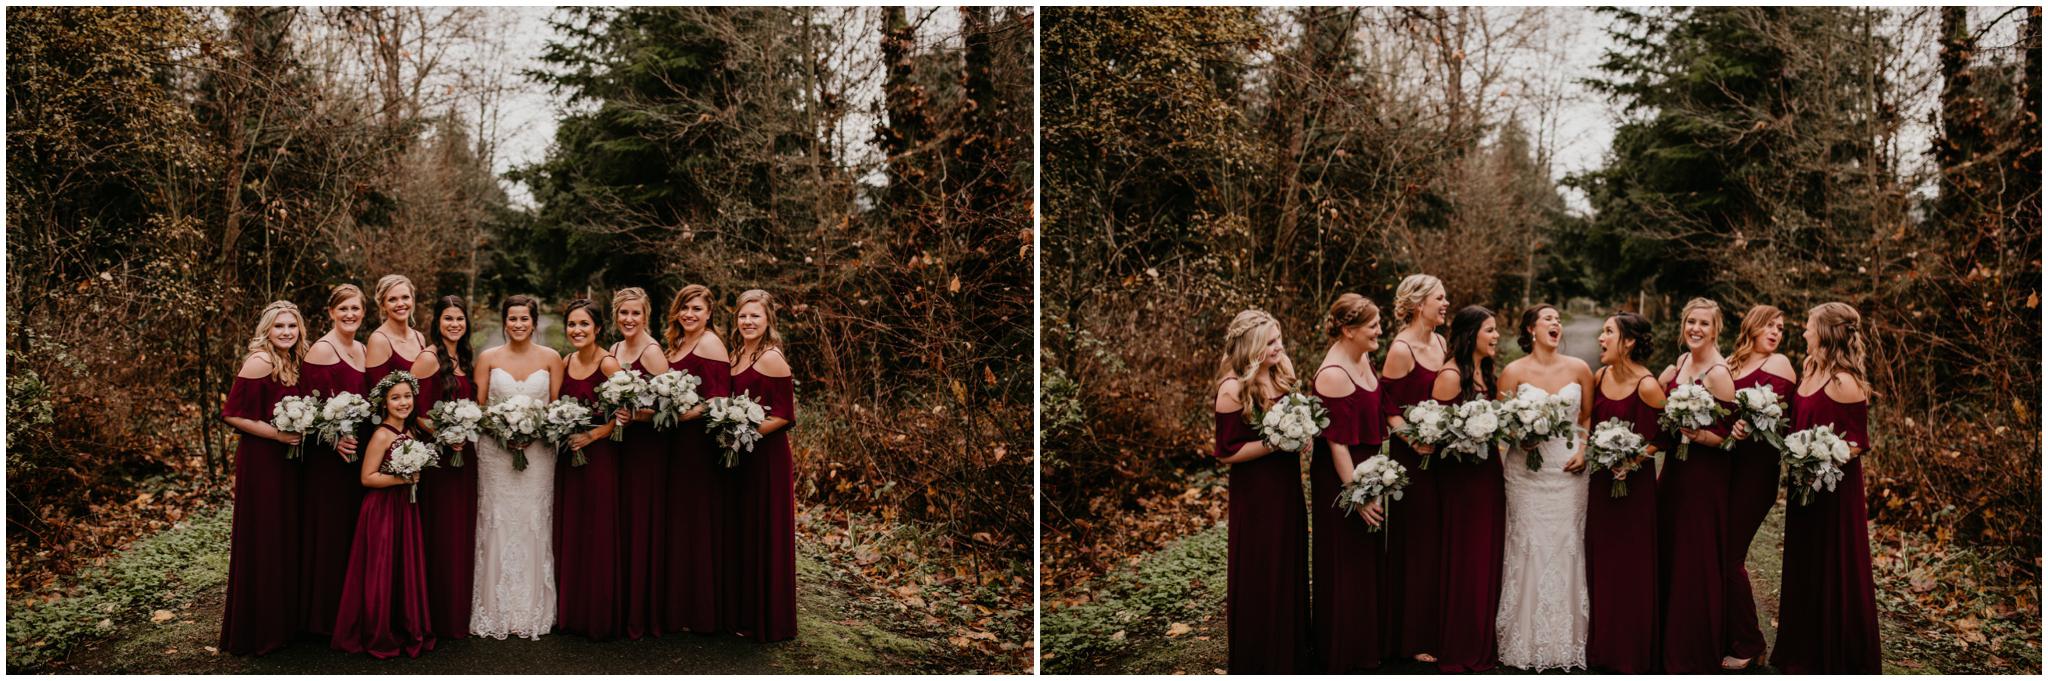 ashley-tj-the-pickering-barn-winter-wedding-seattle-photographer-033.jpg